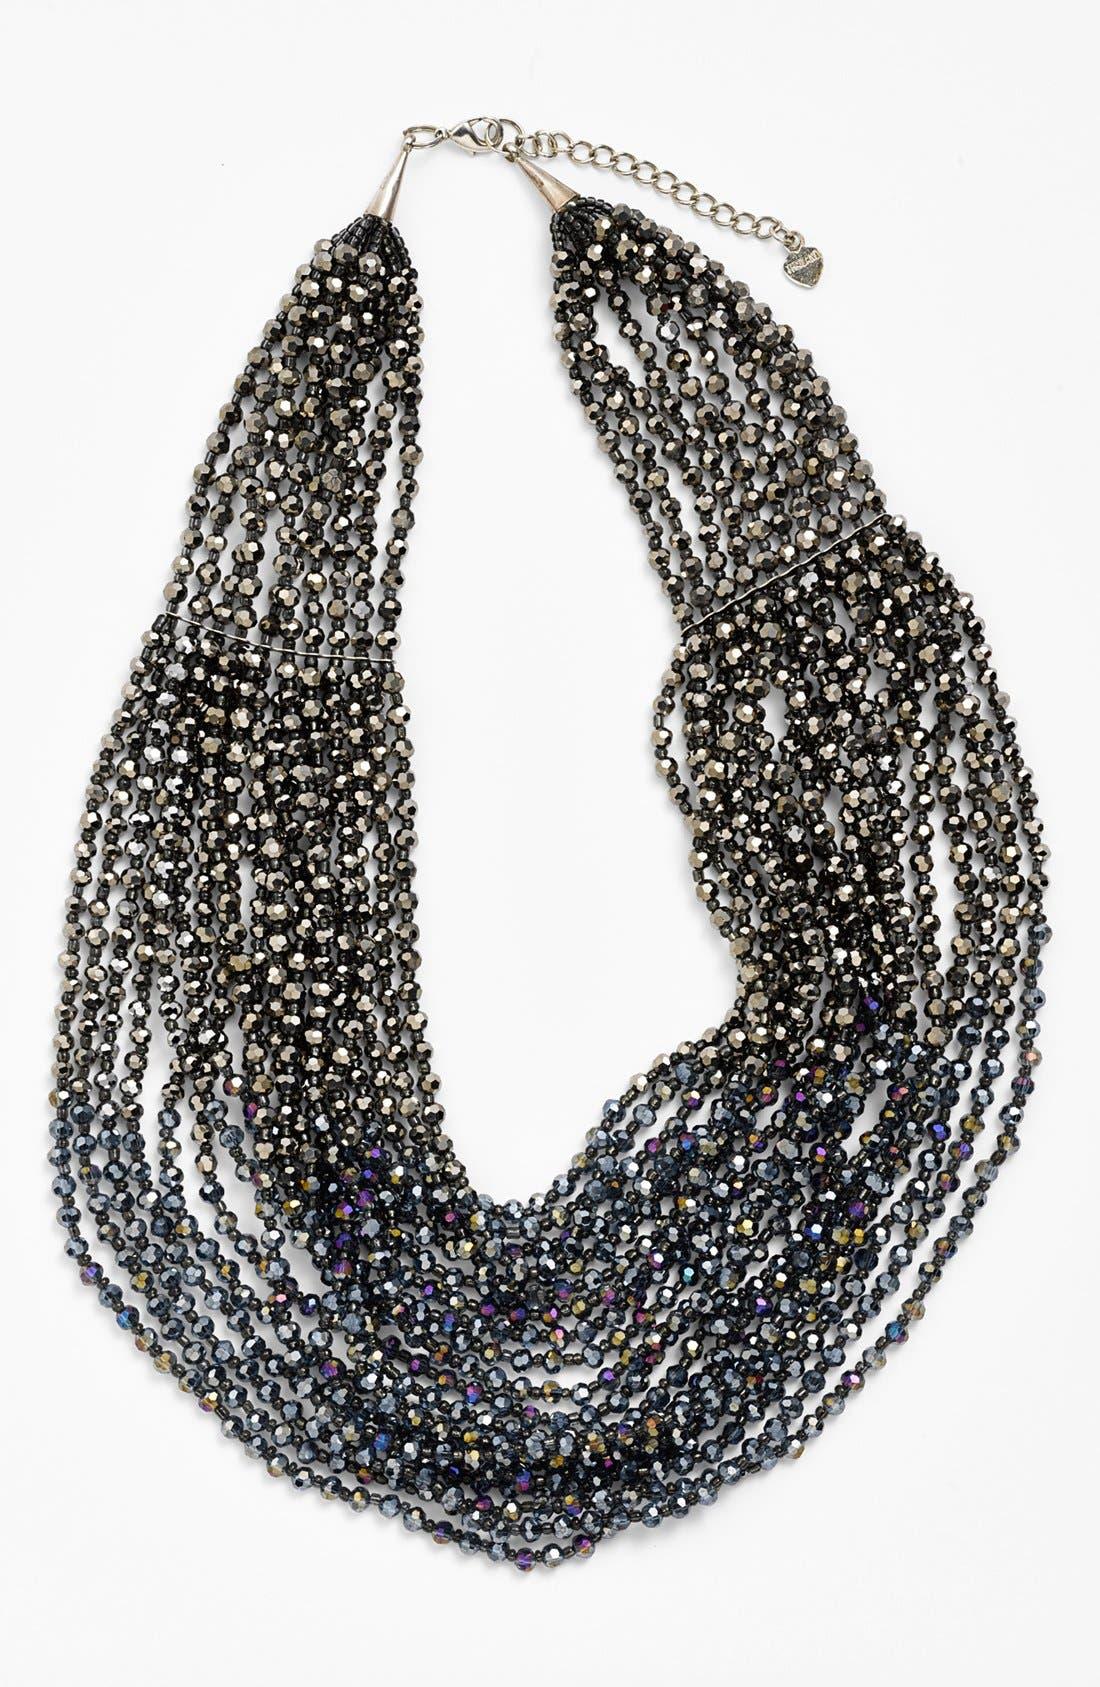 Alternate Image 1 Selected - Nakamol Design Multistrand Necklace